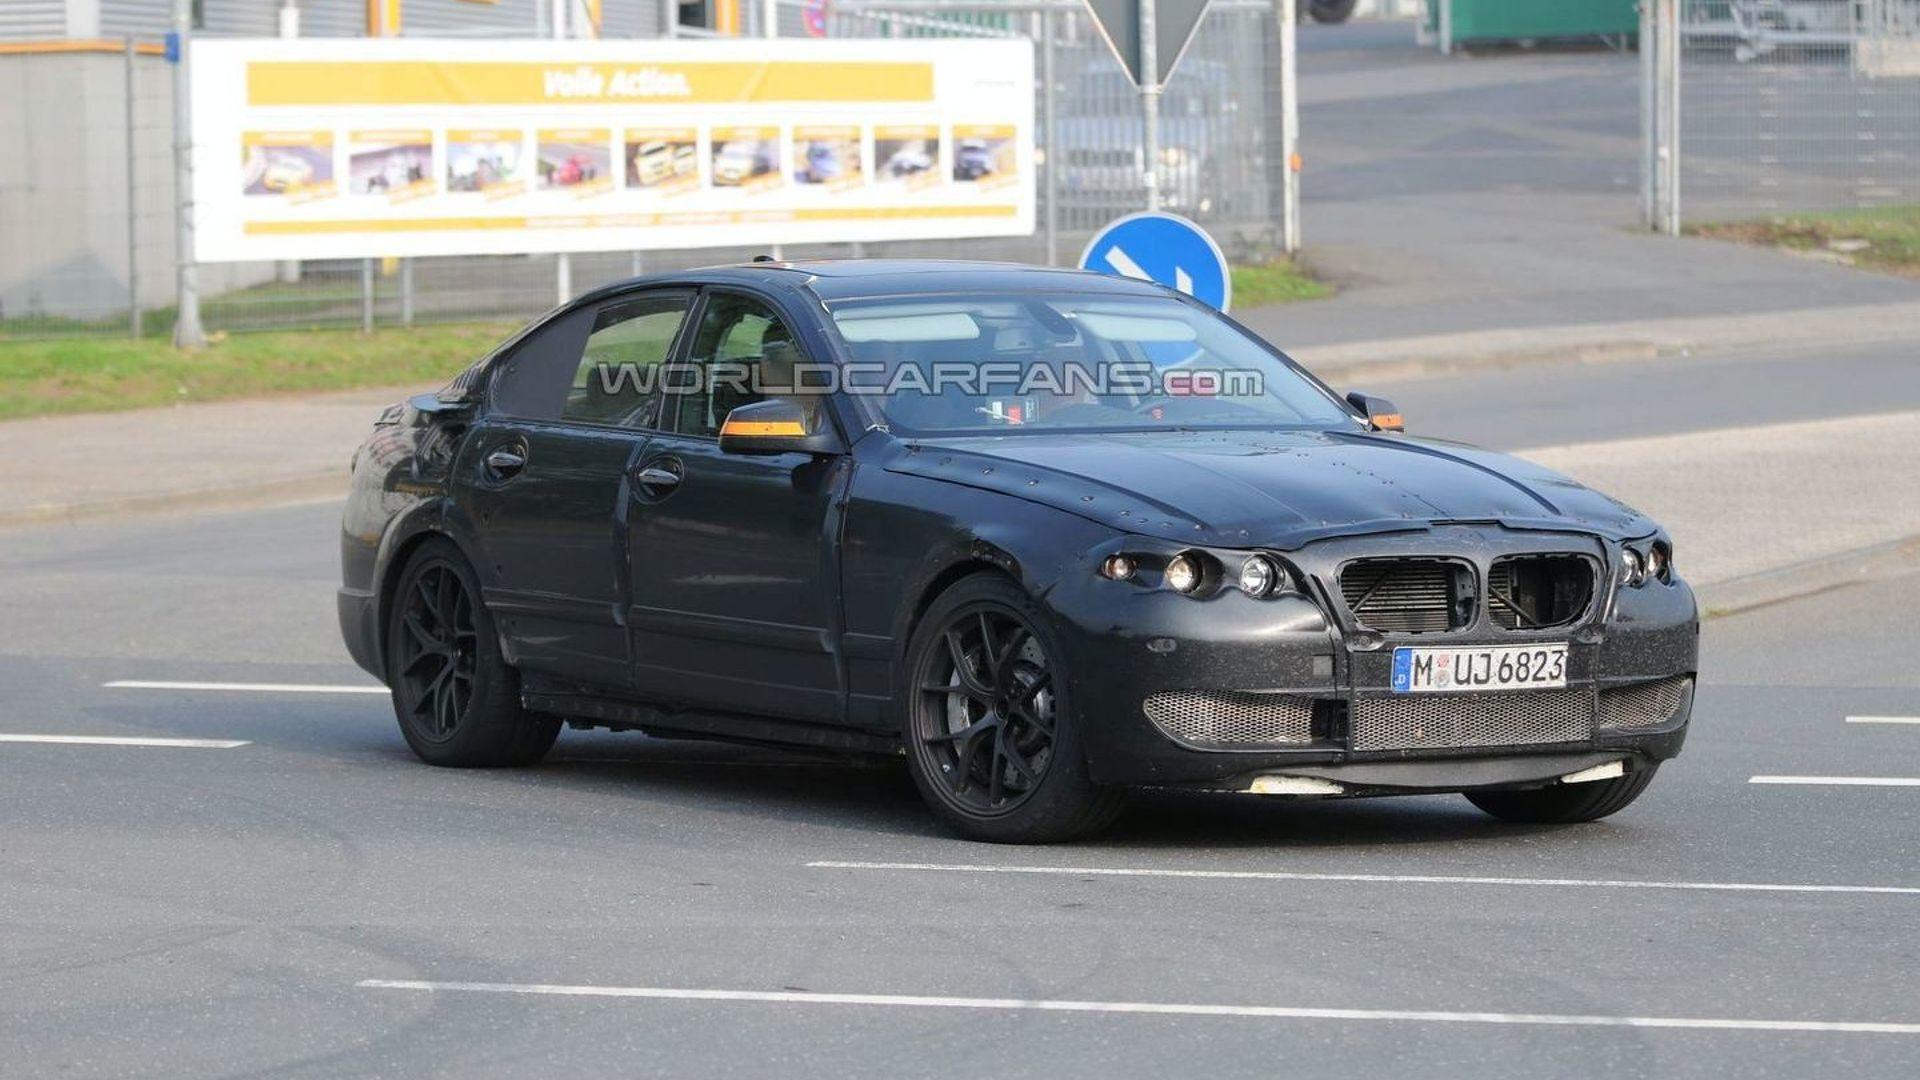 2011 BMW M5 spy photos show new details